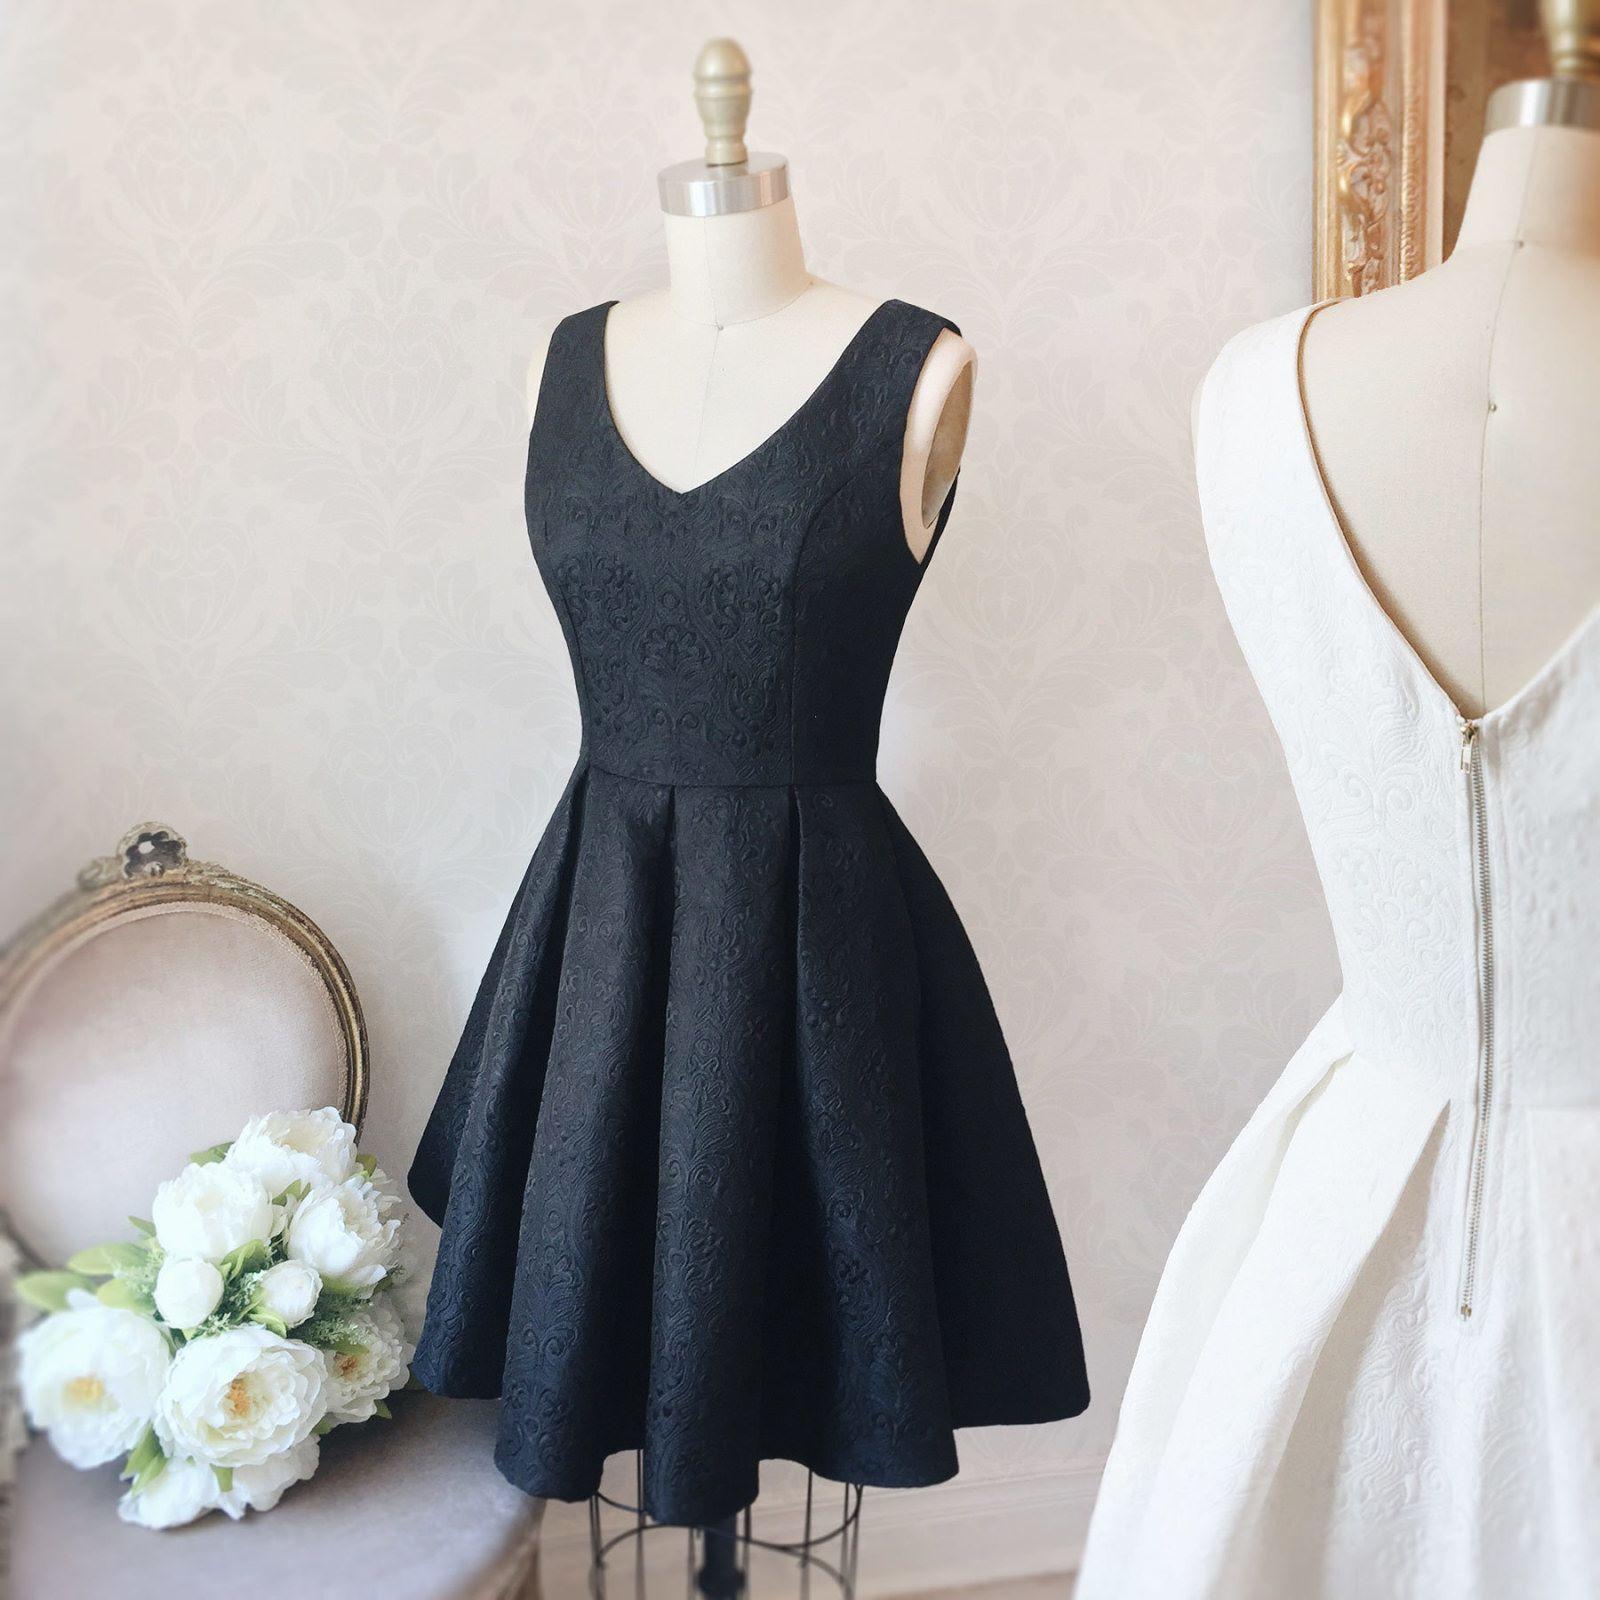 Teana black vintage prom robe and elegant cocktail dress